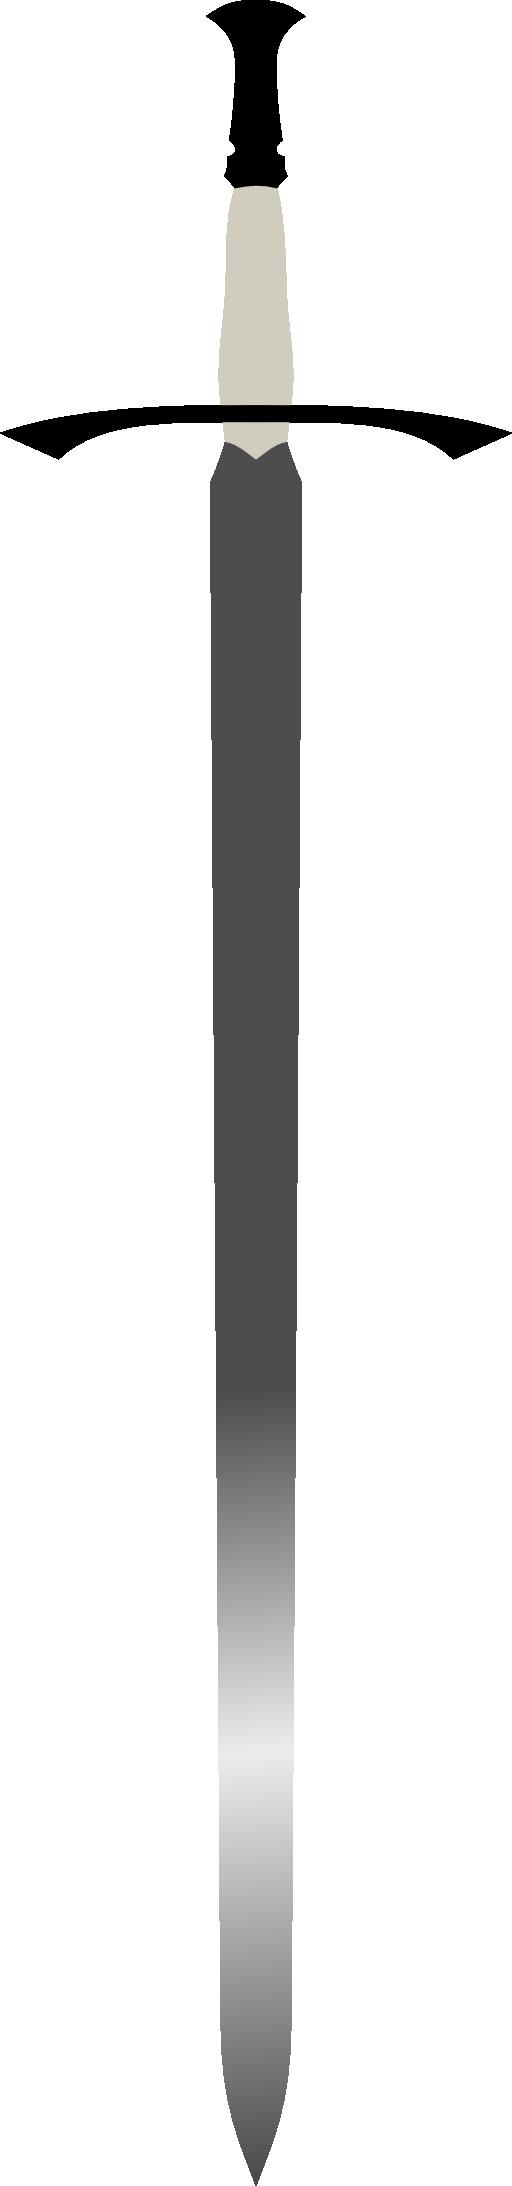 Frames illustrations hd images. Clipart sword horizontal